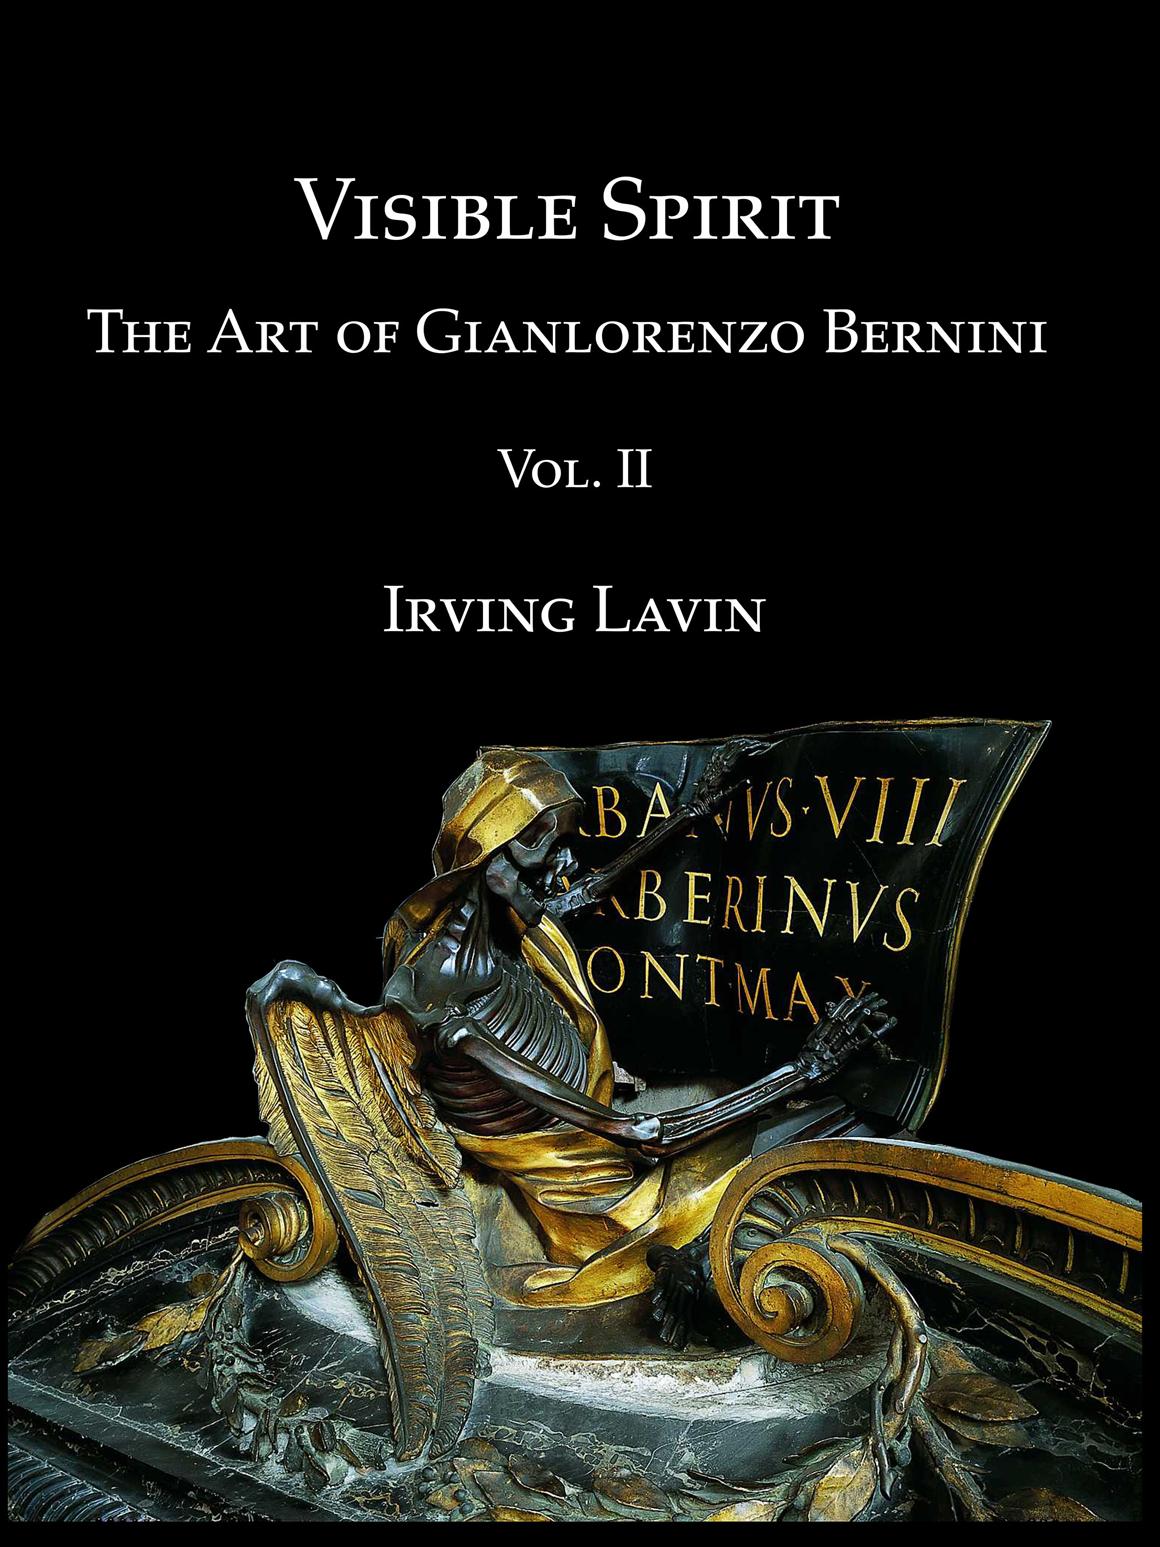 Irving Lavin